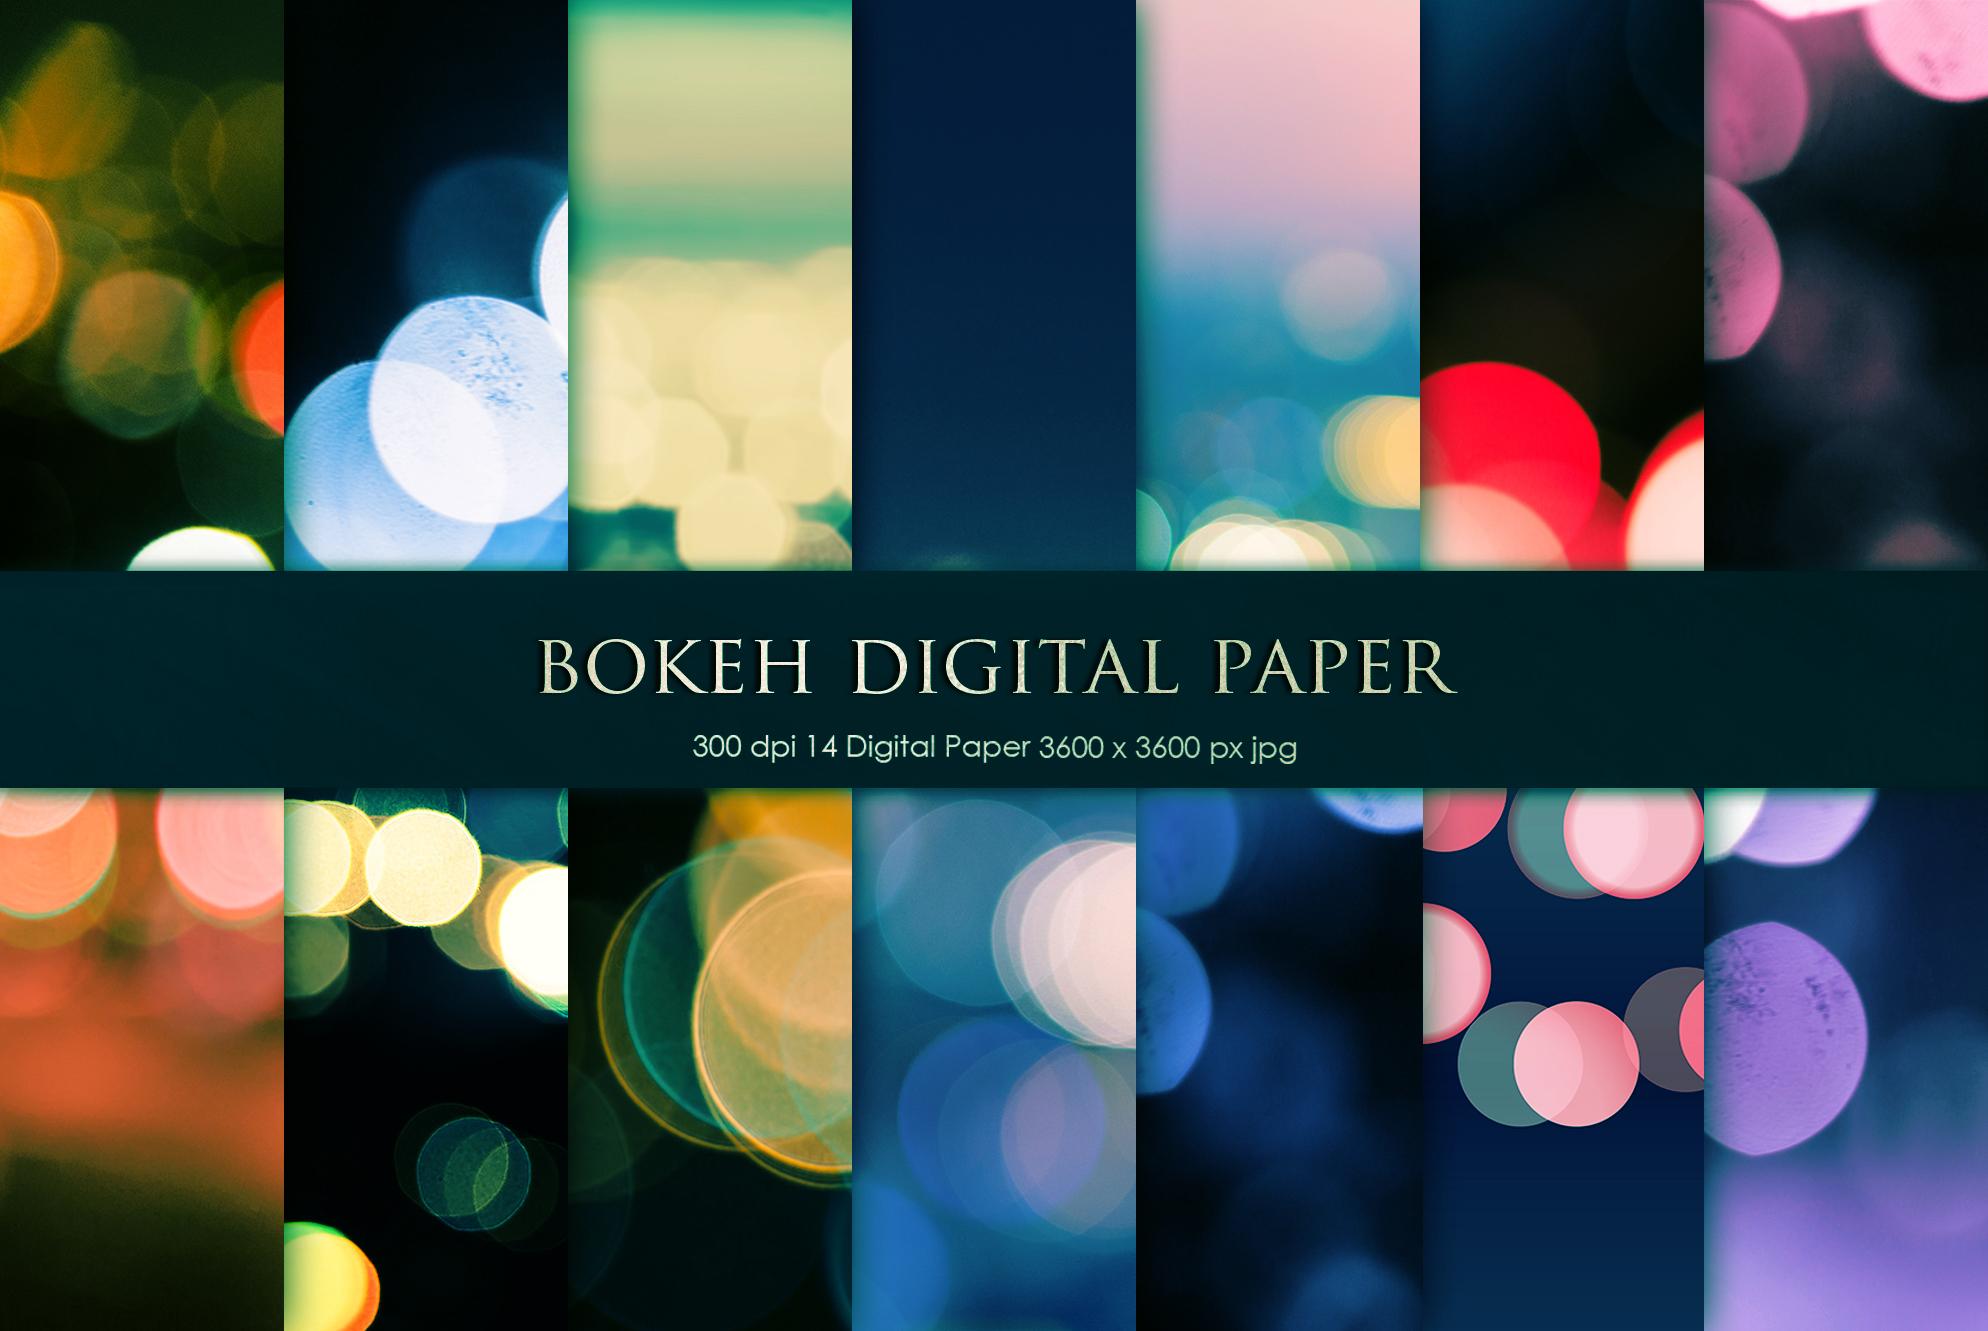 Bokeh Digital Paper, Backgrounds example image 1